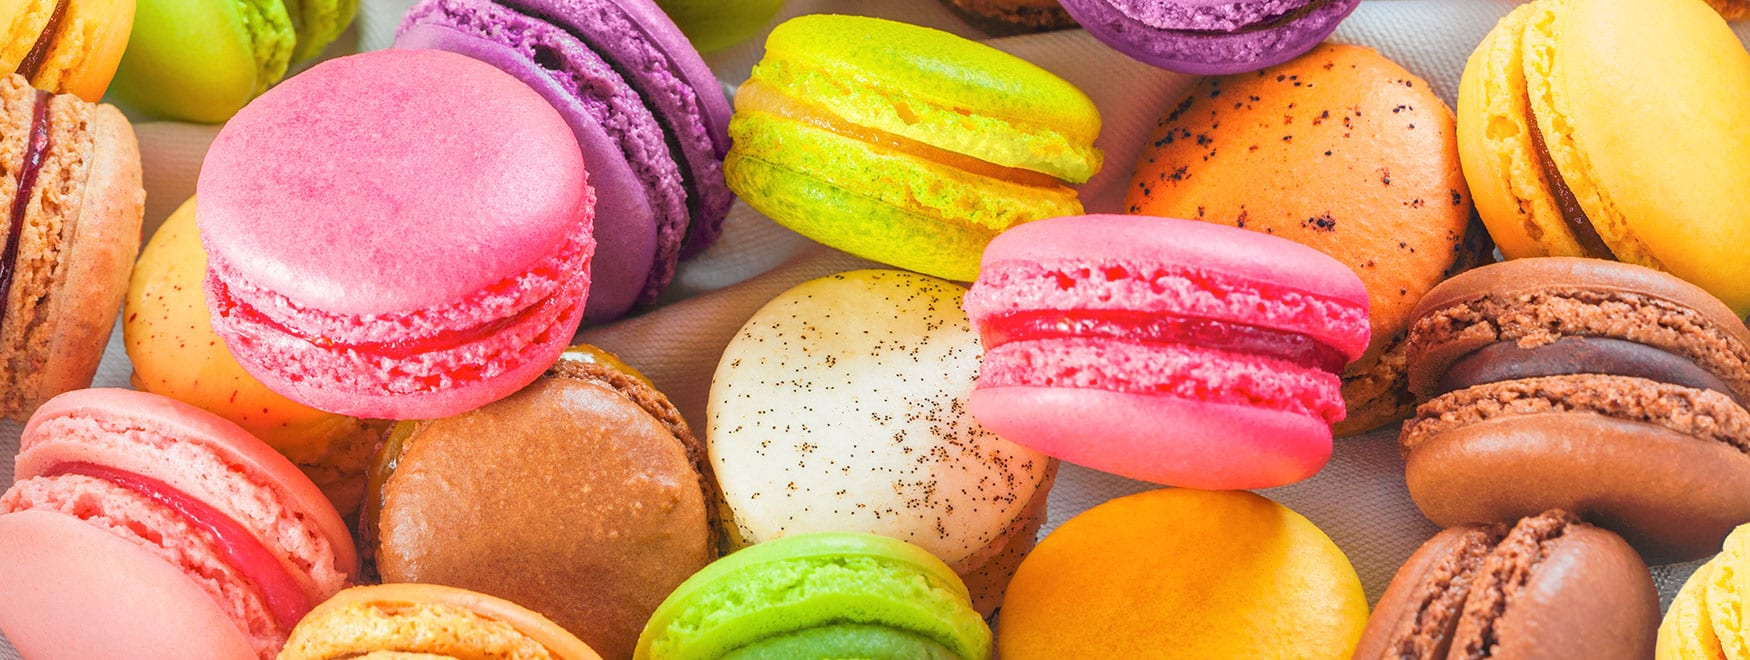 Macaron workshop visit with a tasting session